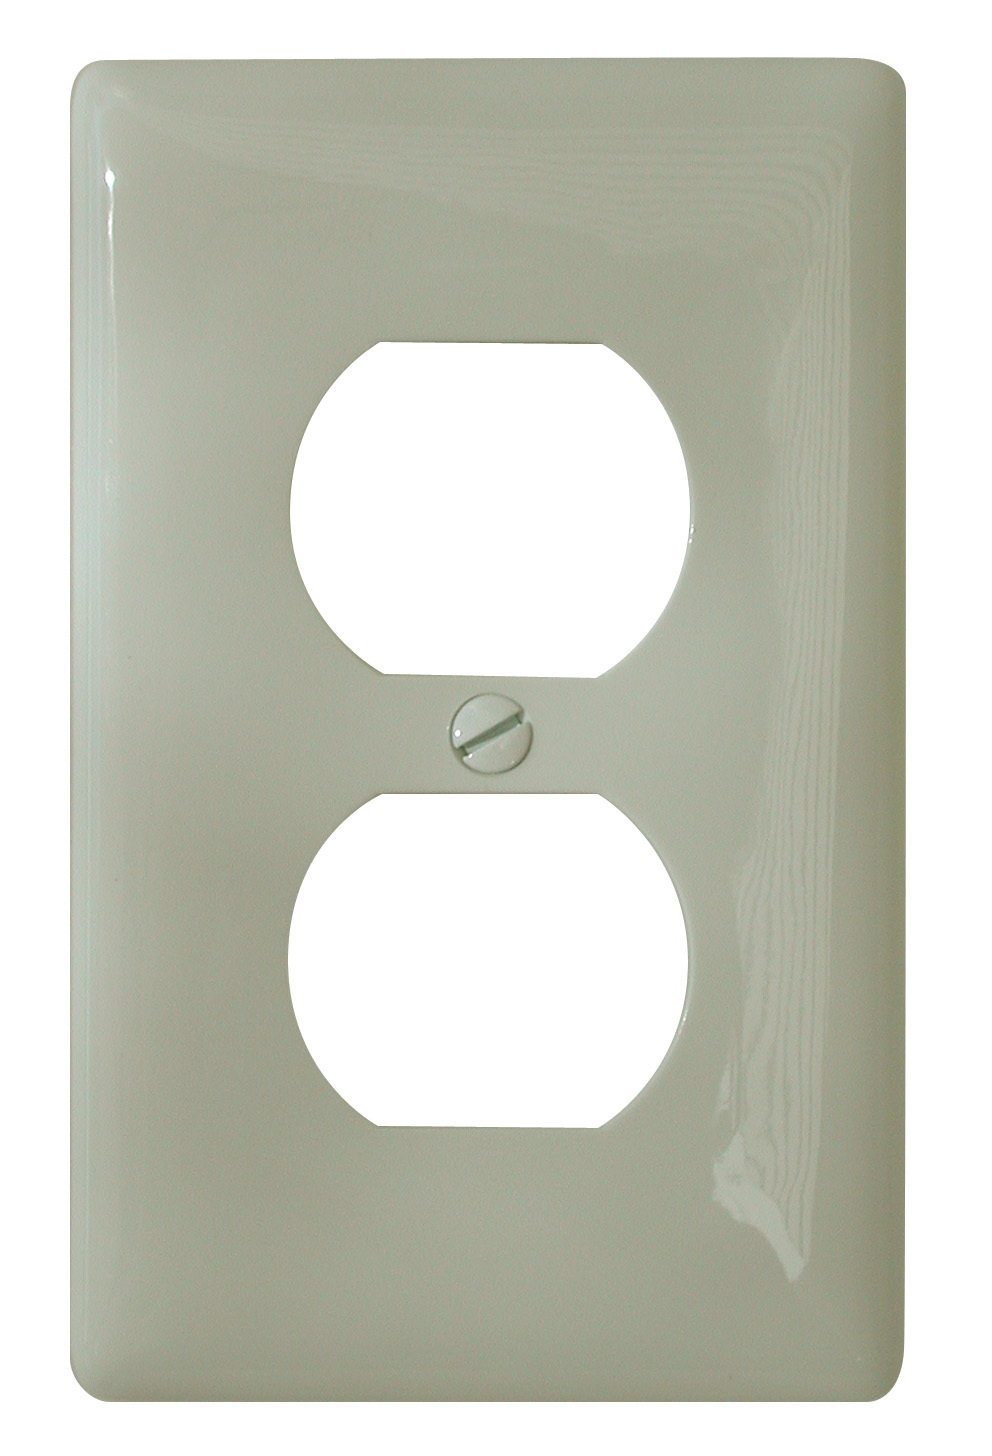 Standard Receptacle Cover - Ivory 4132V